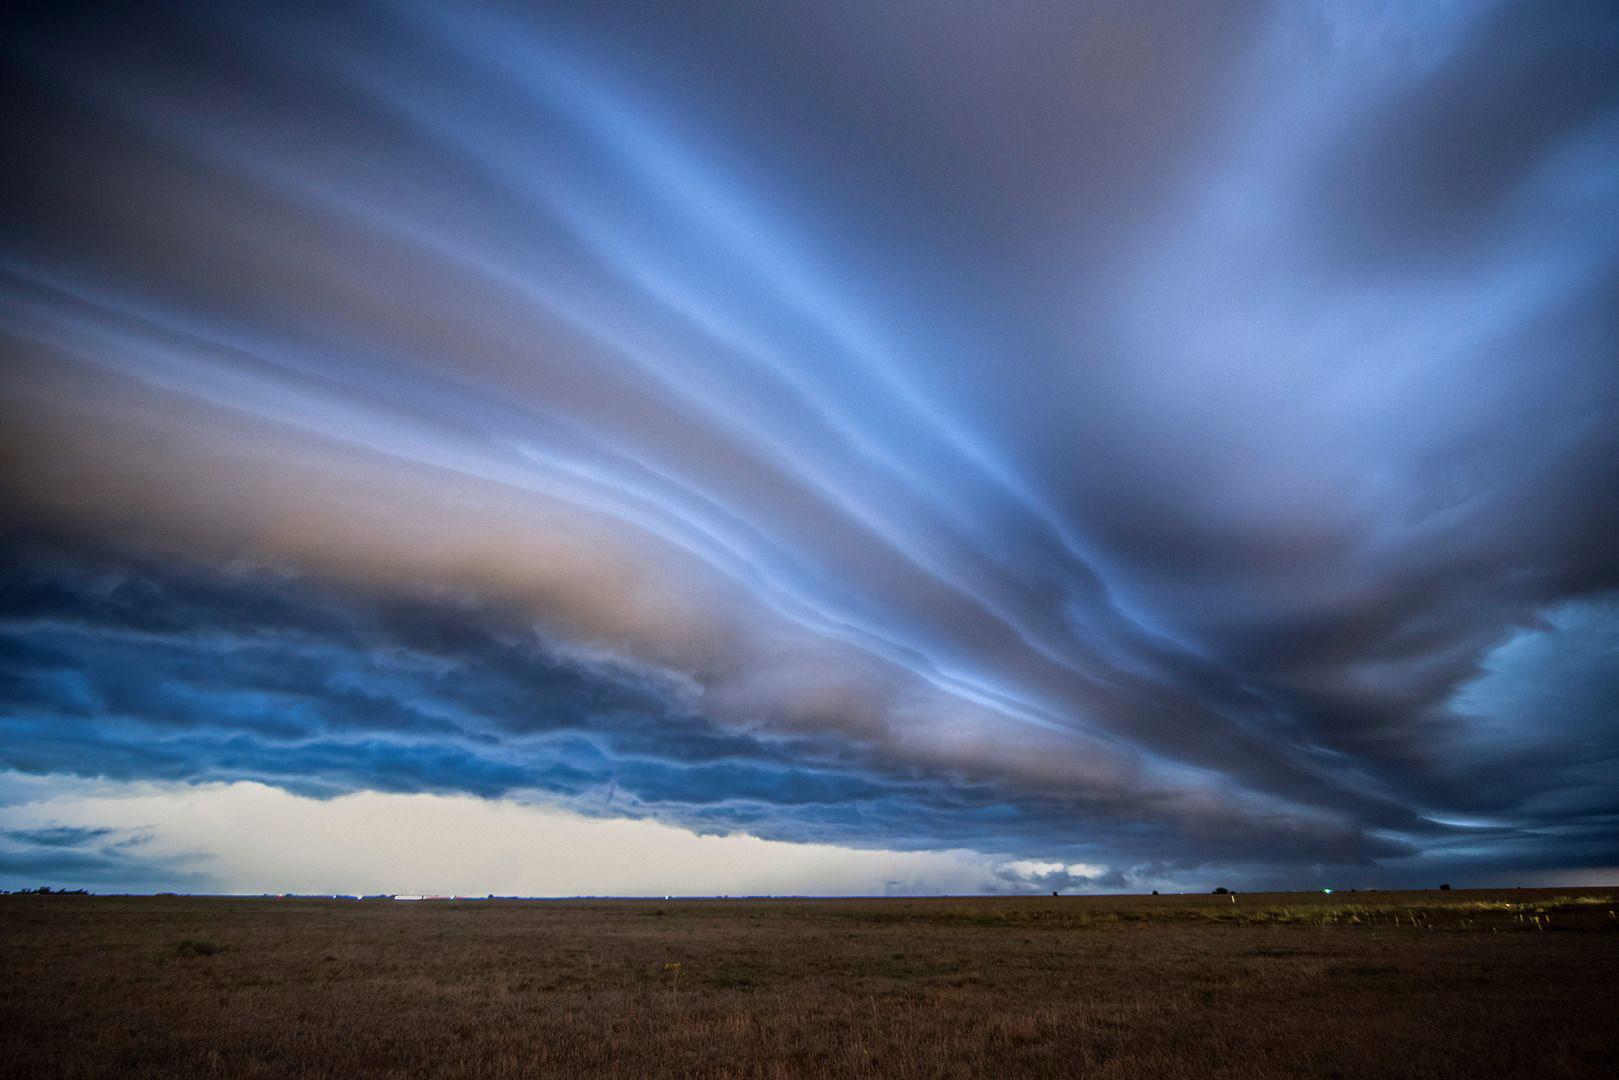 Хантра, © Тина Райт, Фотоконкурс «Погодный фотограф года» — Weather Photographer of the Year